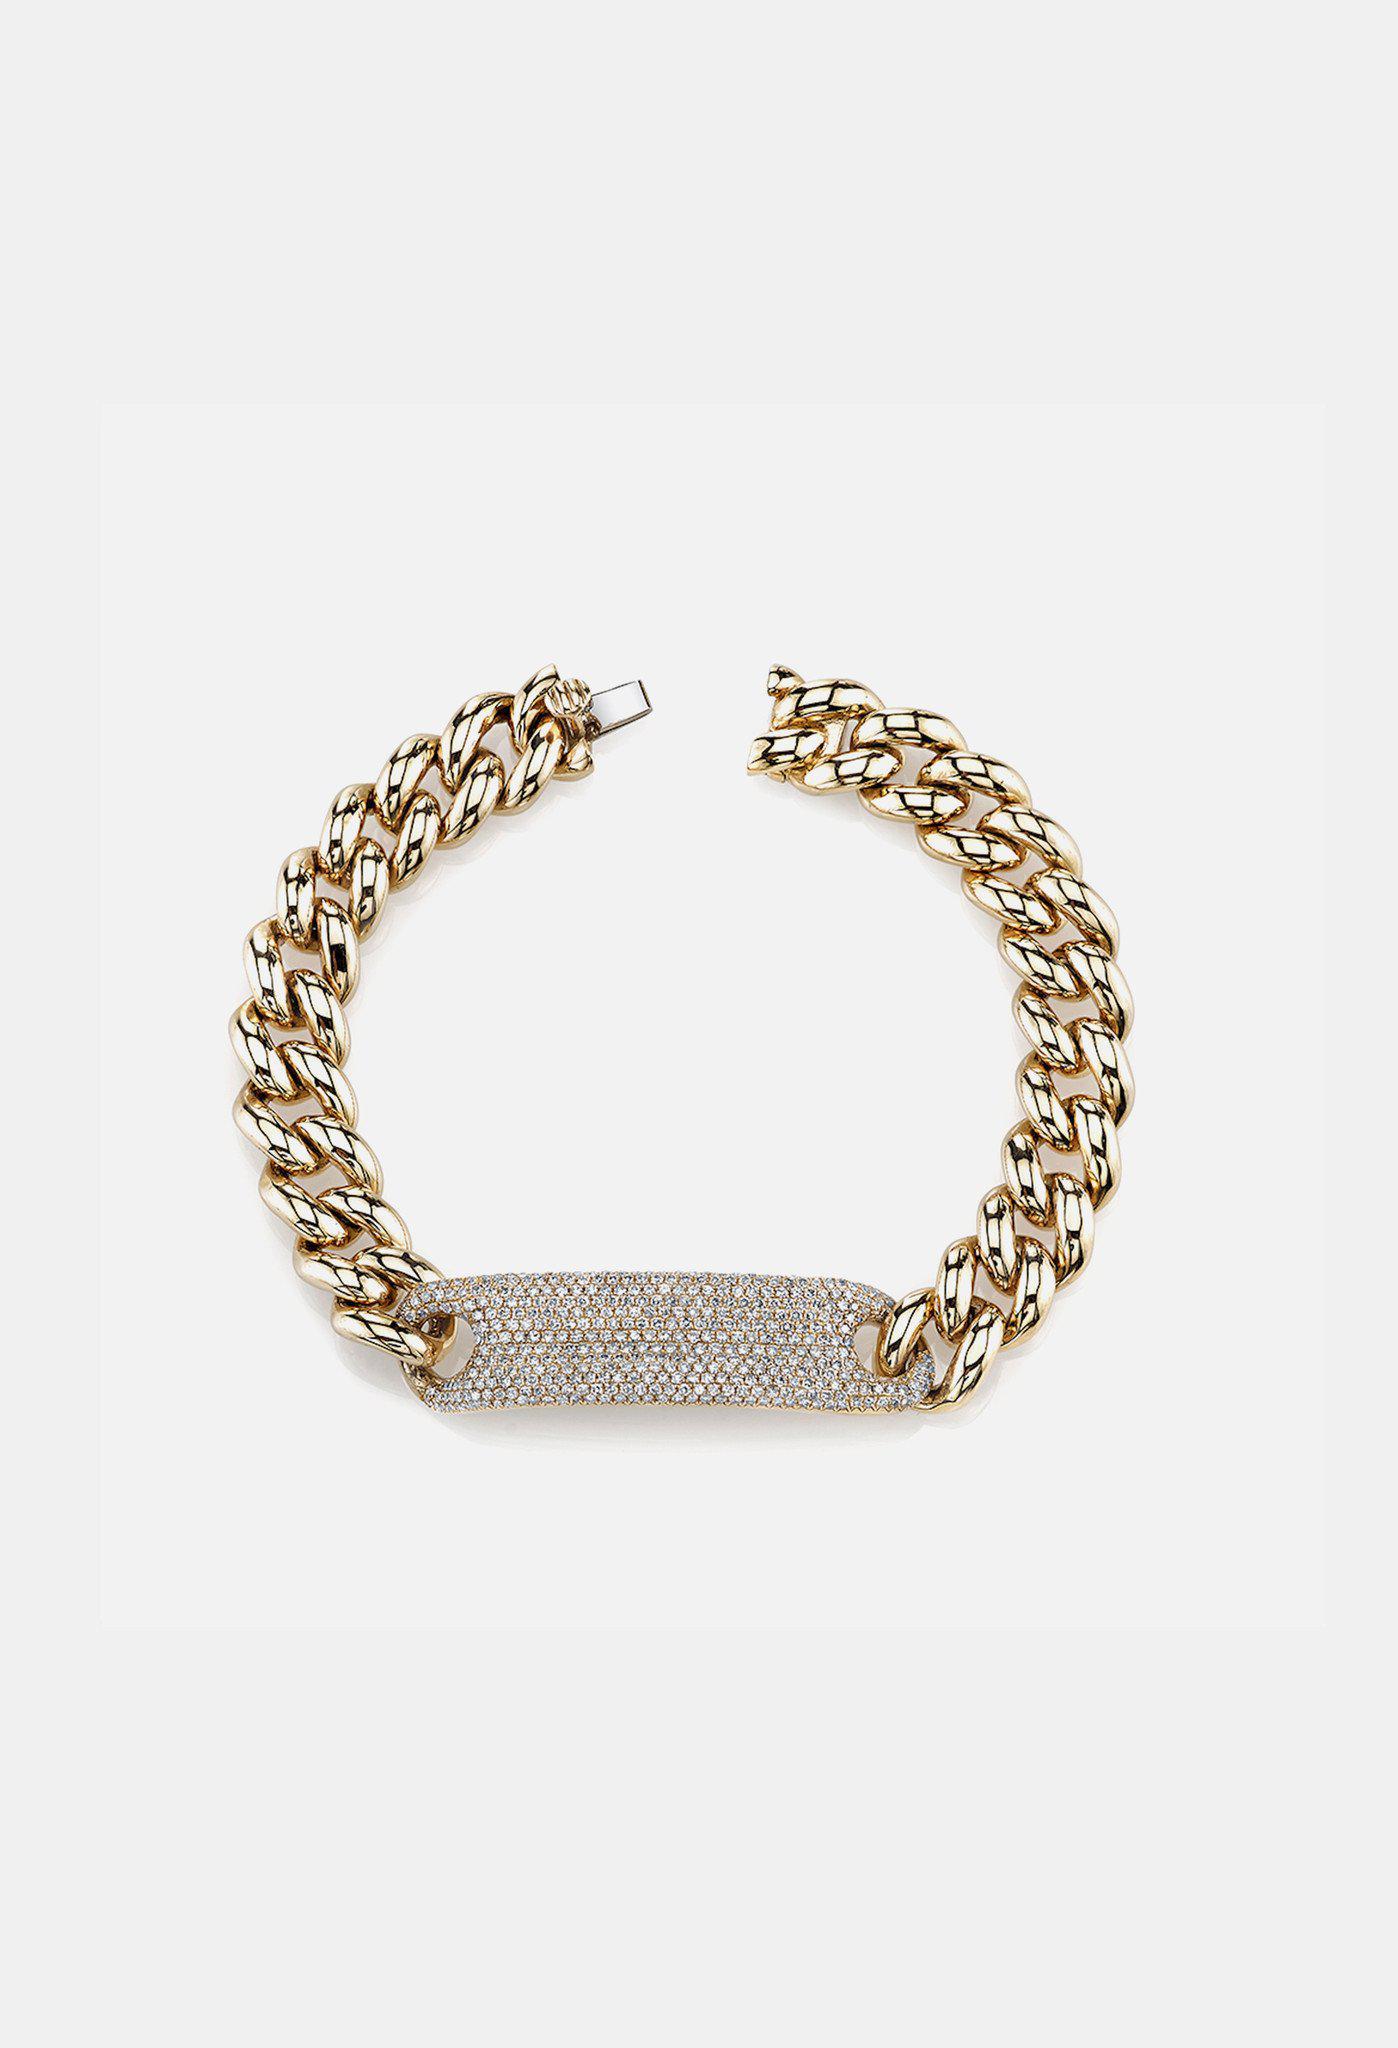 Essential Gemstone link bracelet Shay coFOJNHLVd